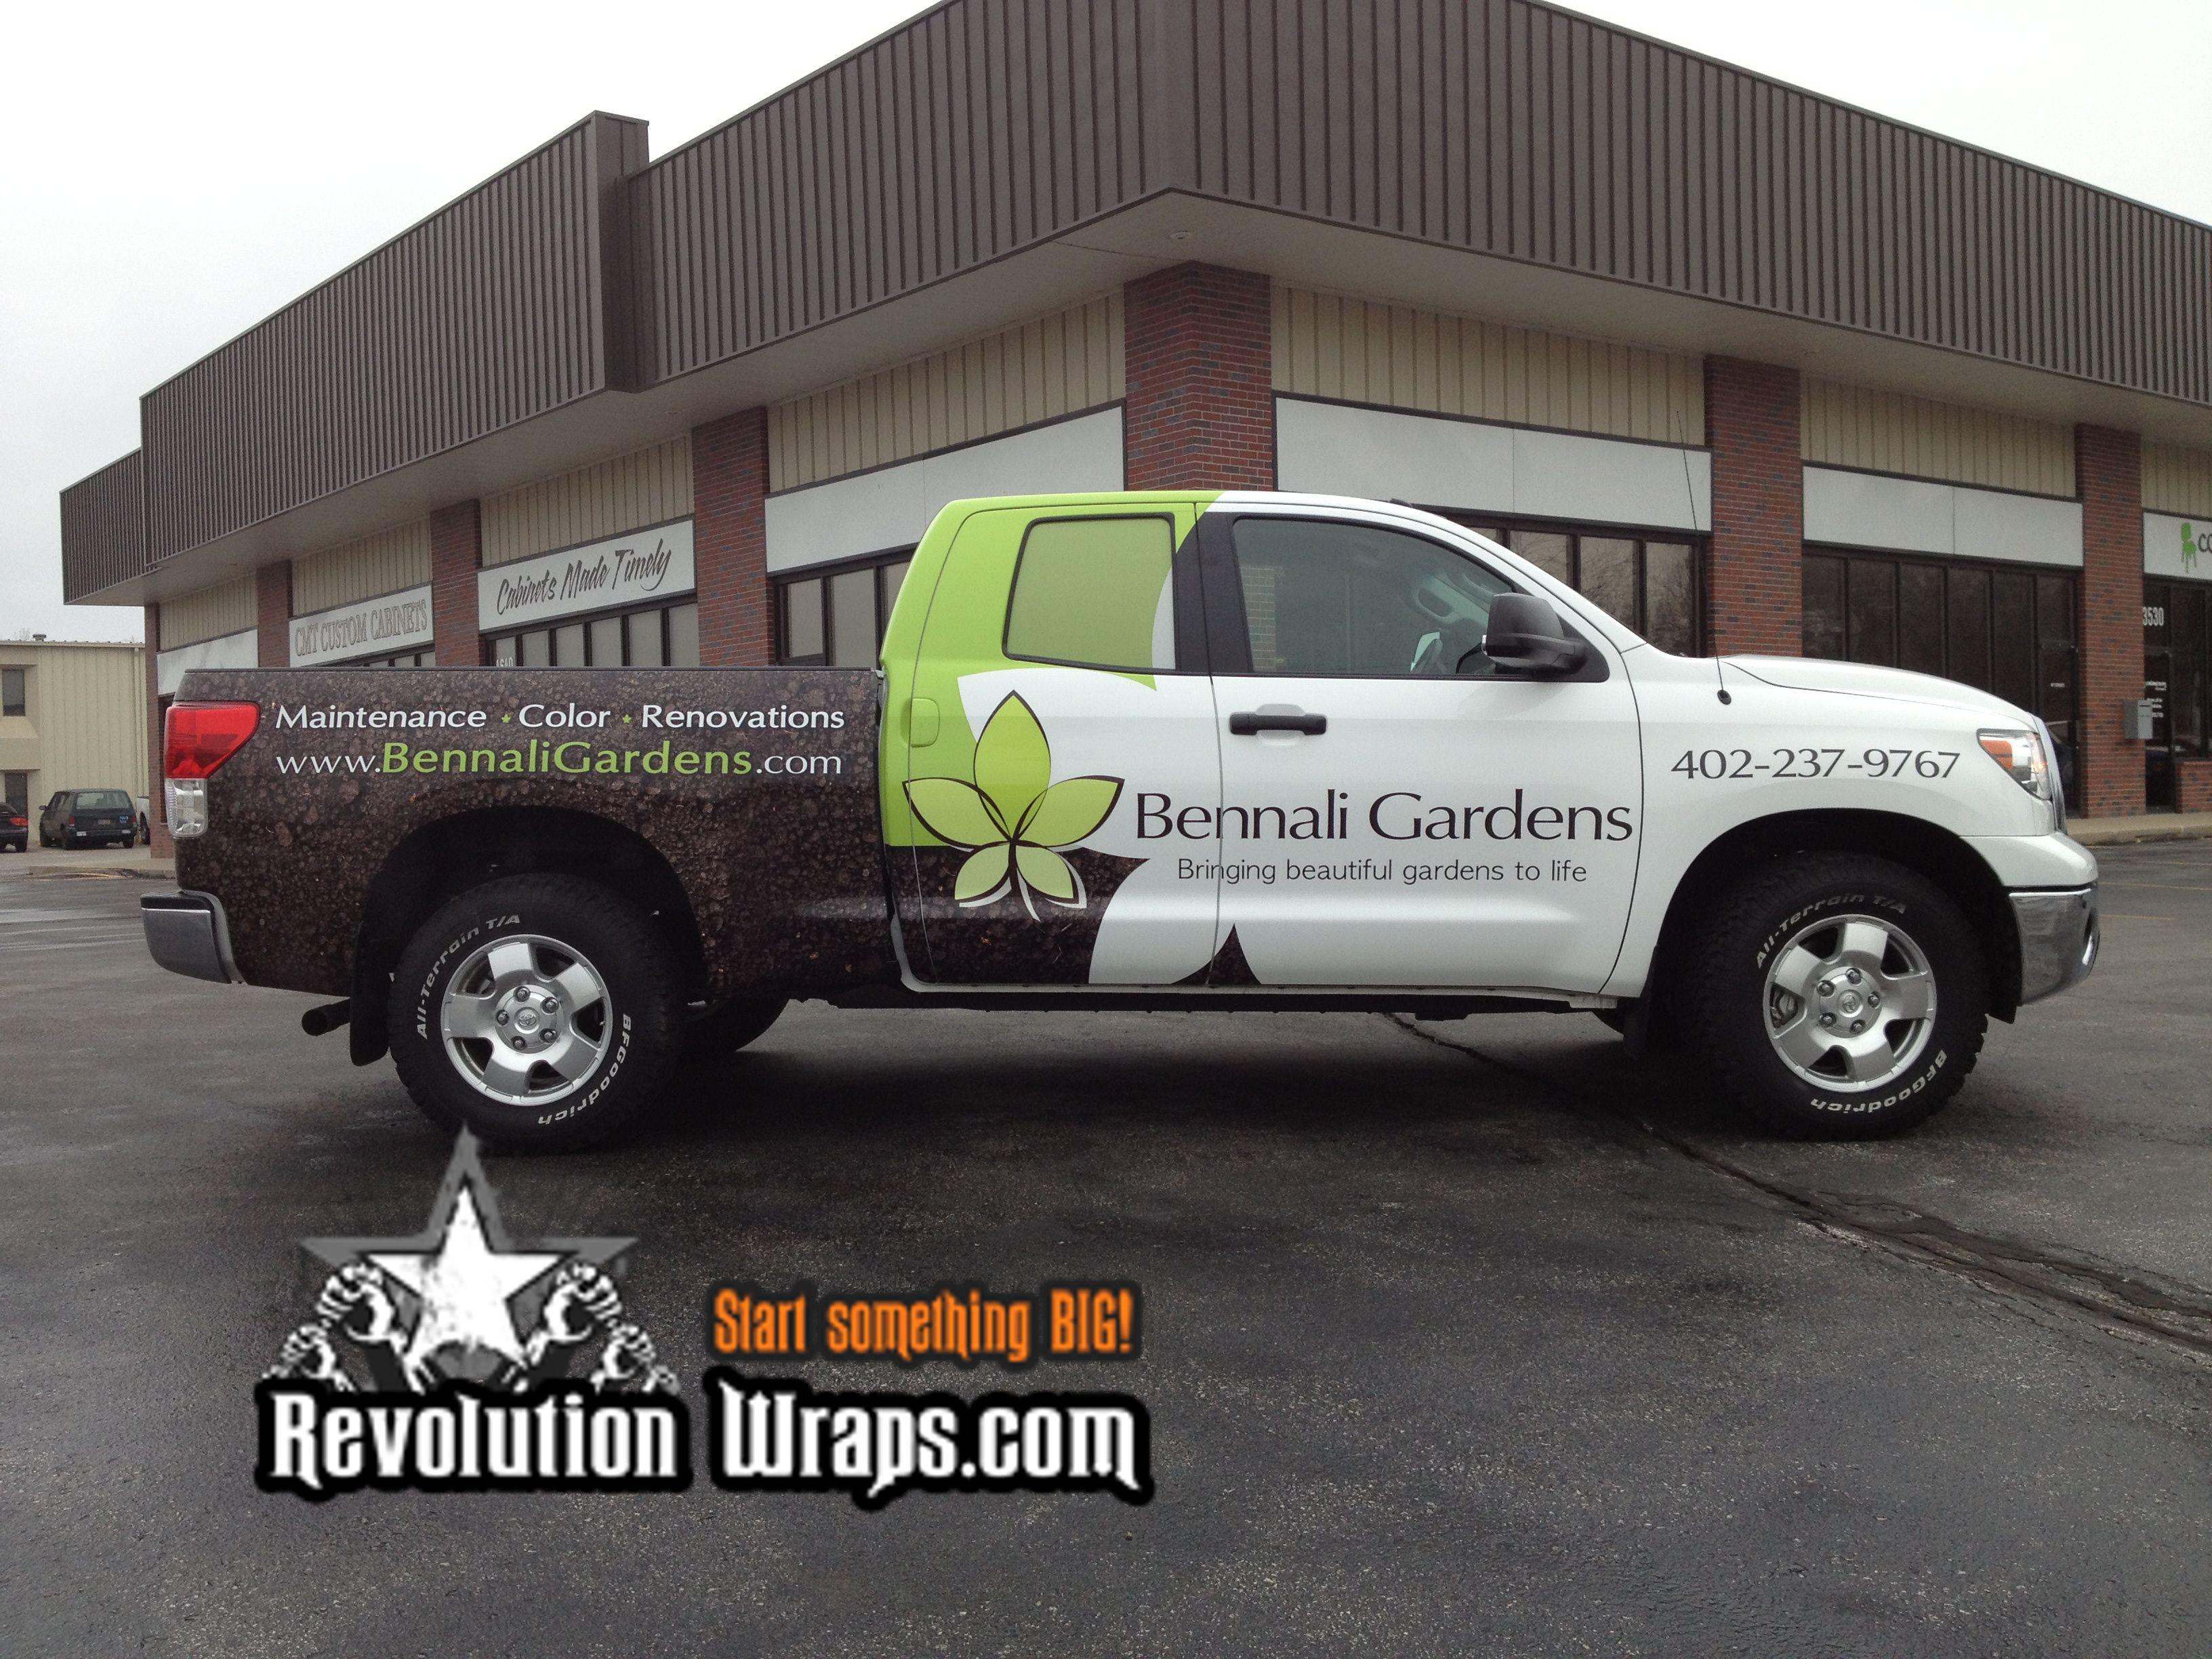 Bennali gardens toyota tundra vehicle wrap by revolution wraps